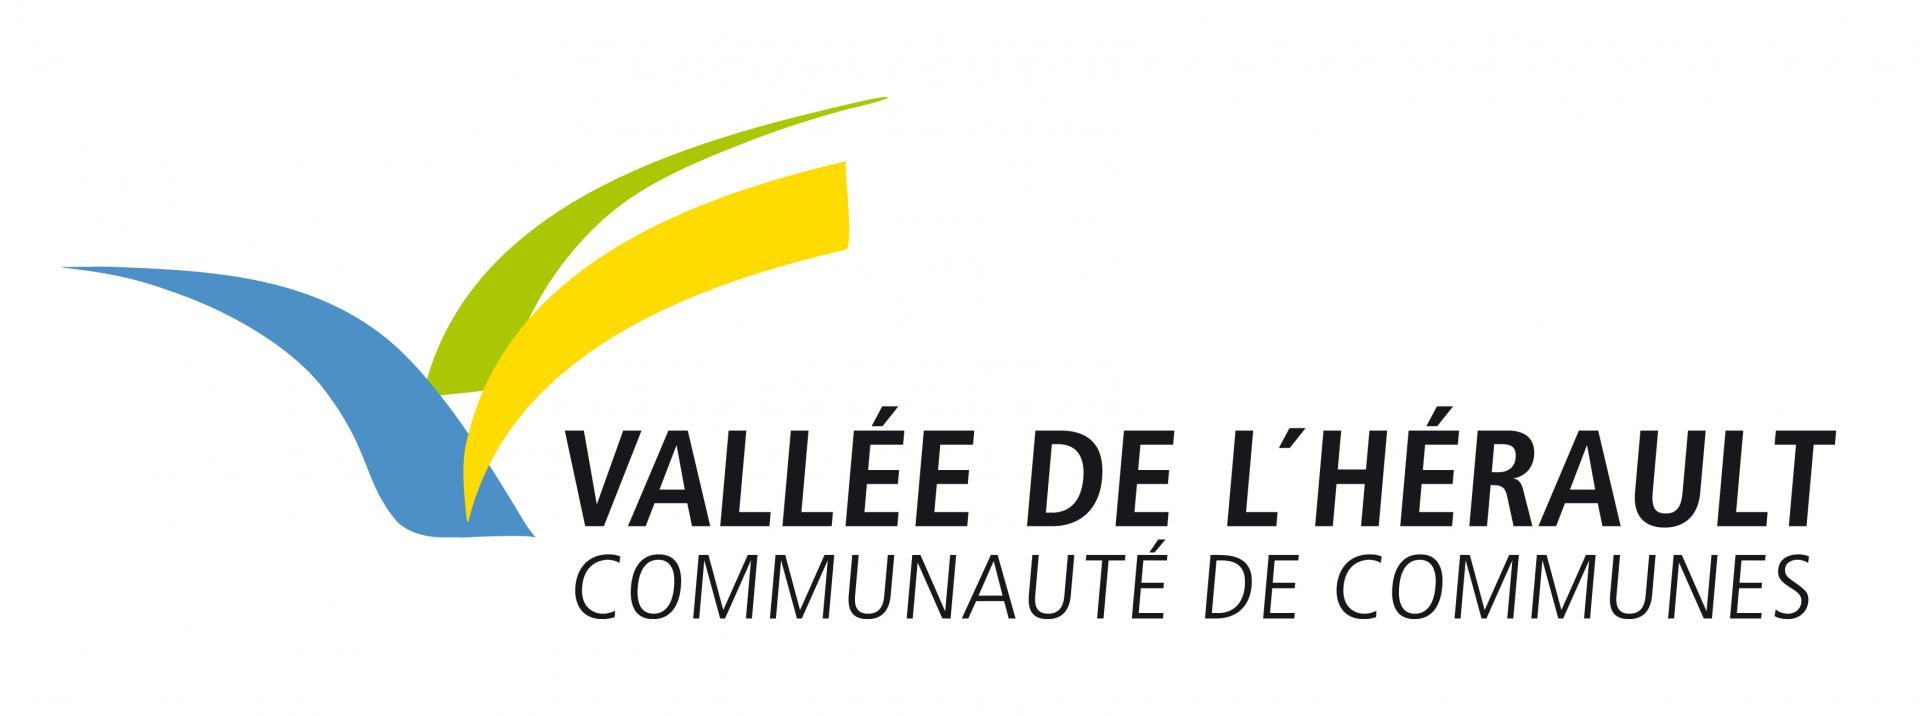 Vallee herault logo 2